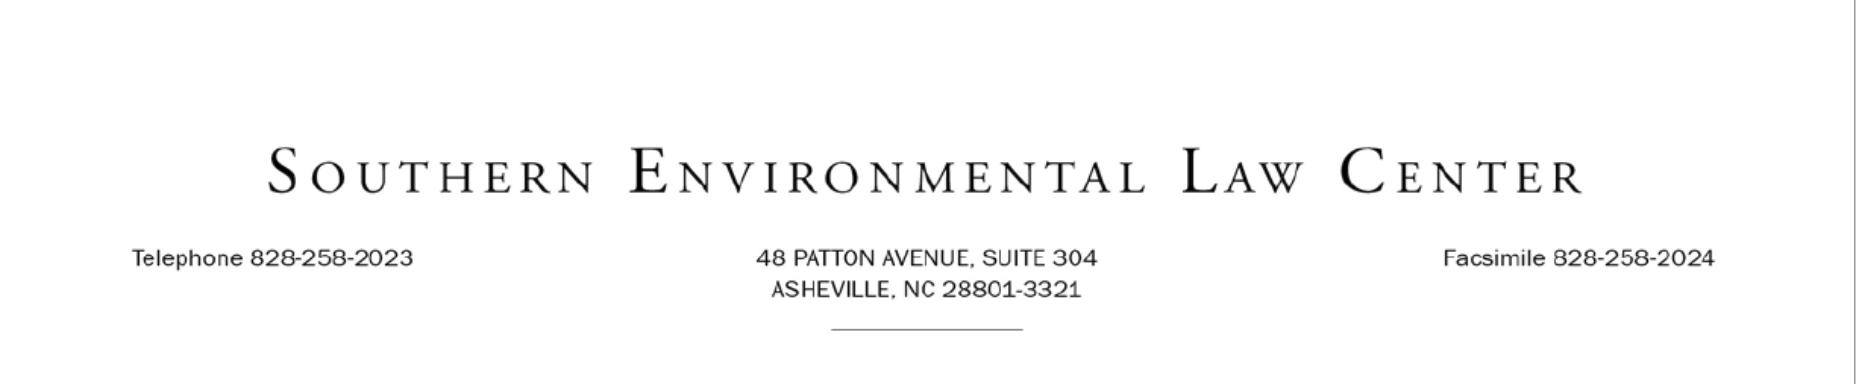 Southern Environmental Law Center Logo